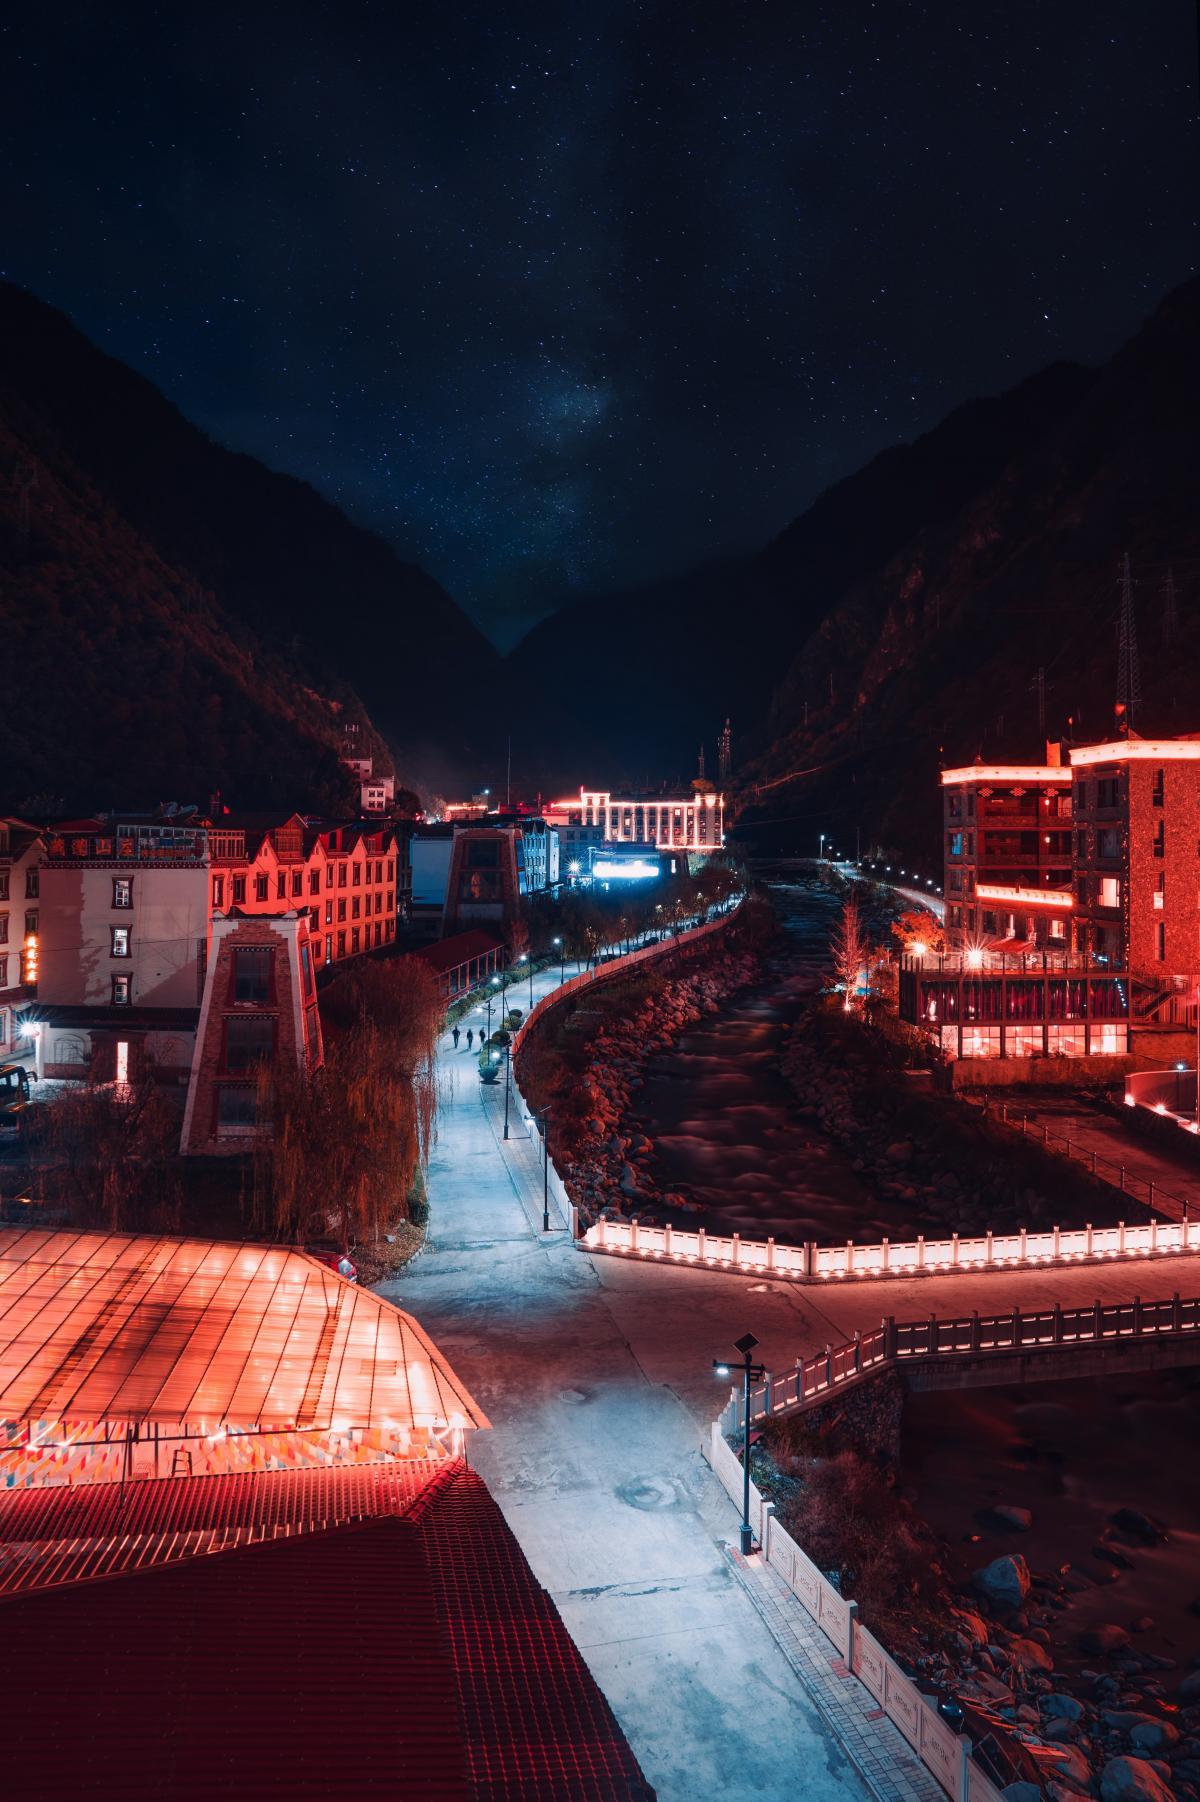 Night City Bridge #426233